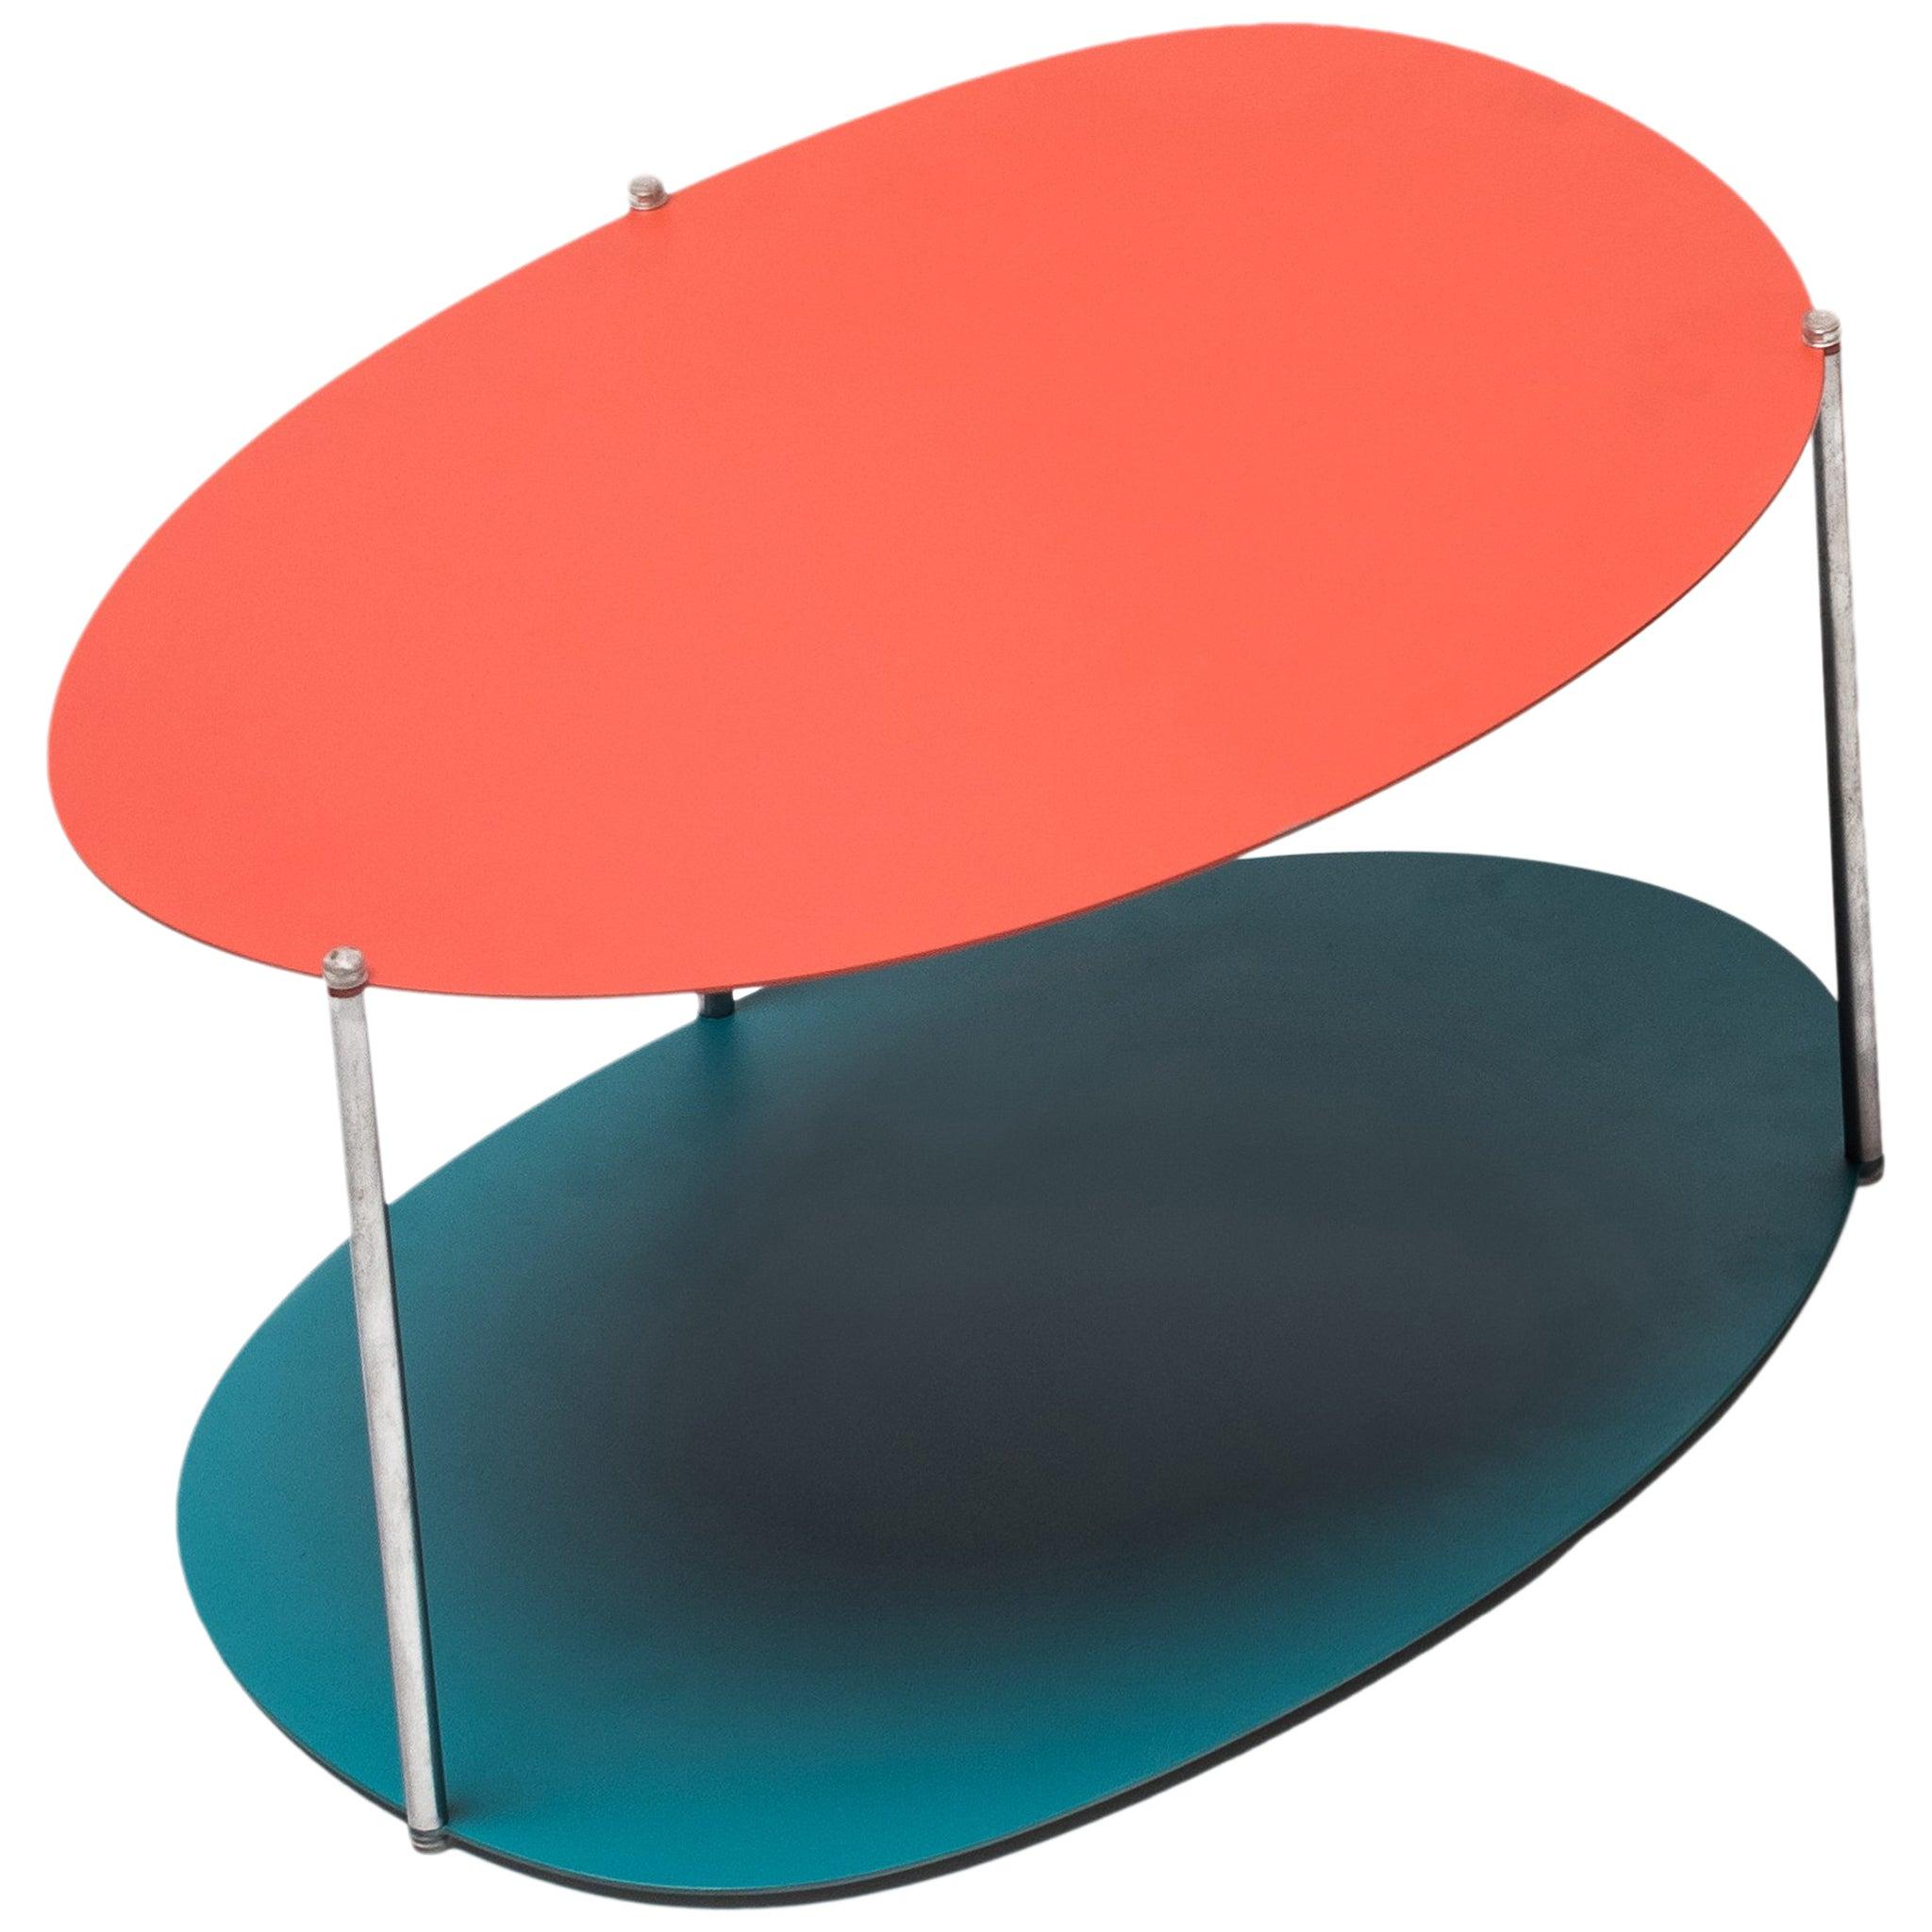 Baleri Italia Medium Picos Coffee Table in Steel by Claesson Koivisto Rune